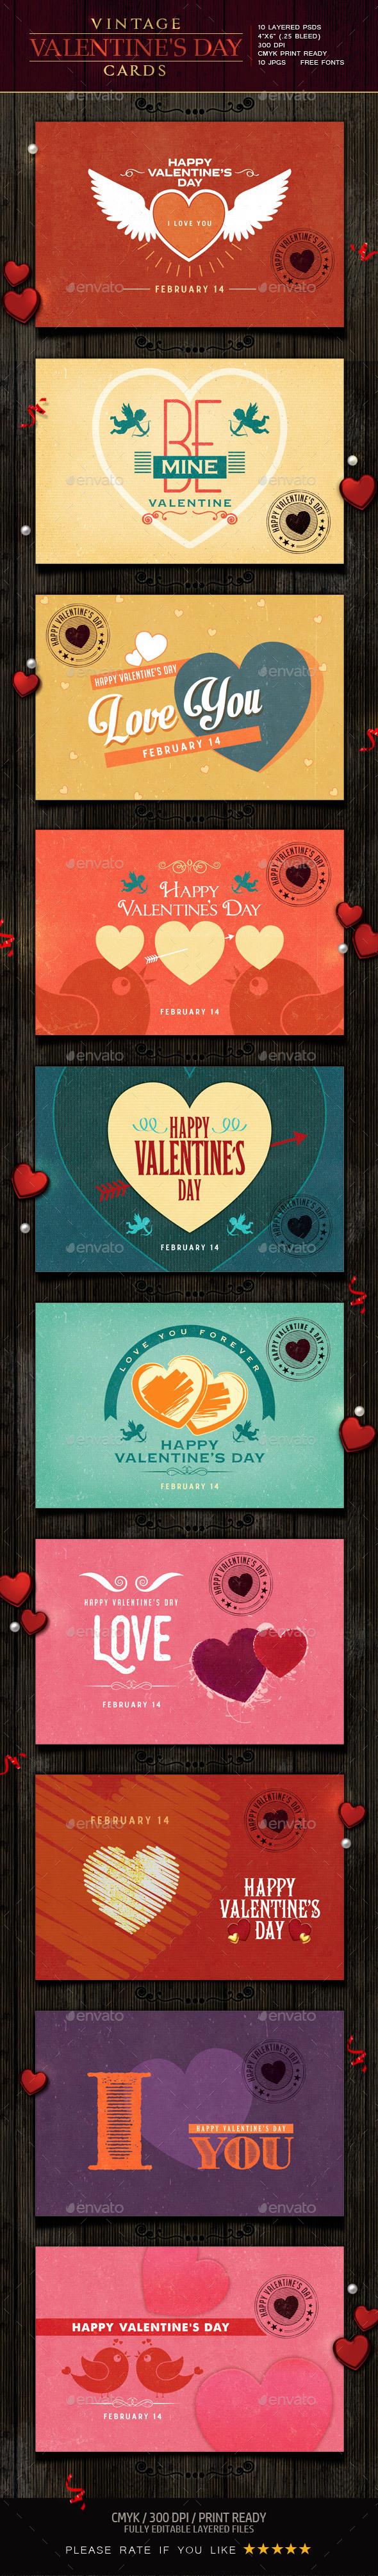 Retro / Vintage Valentine Cards - Cards & Invites Print Templates